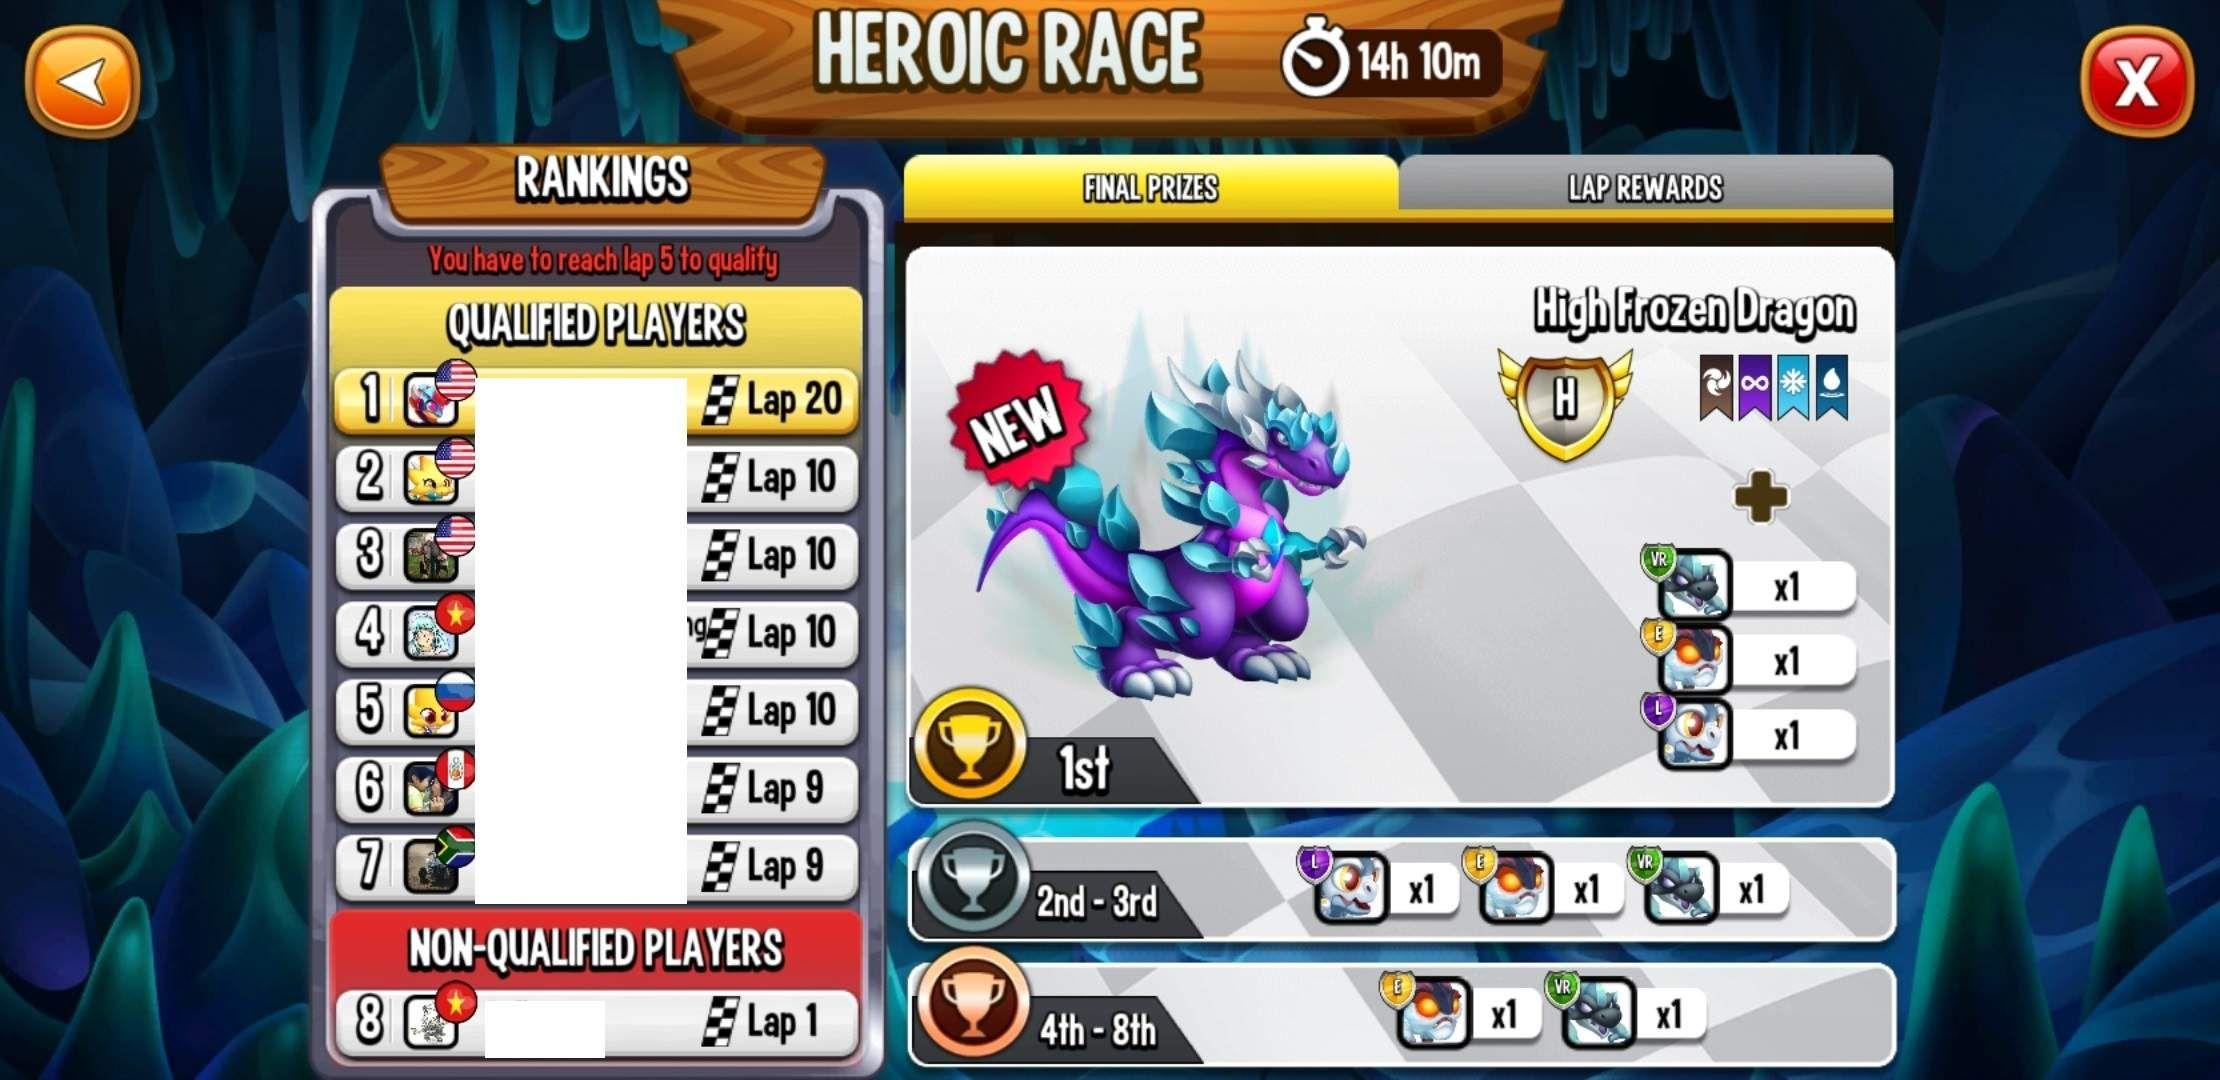 0_1578257723696_010520 racing complete.jpg